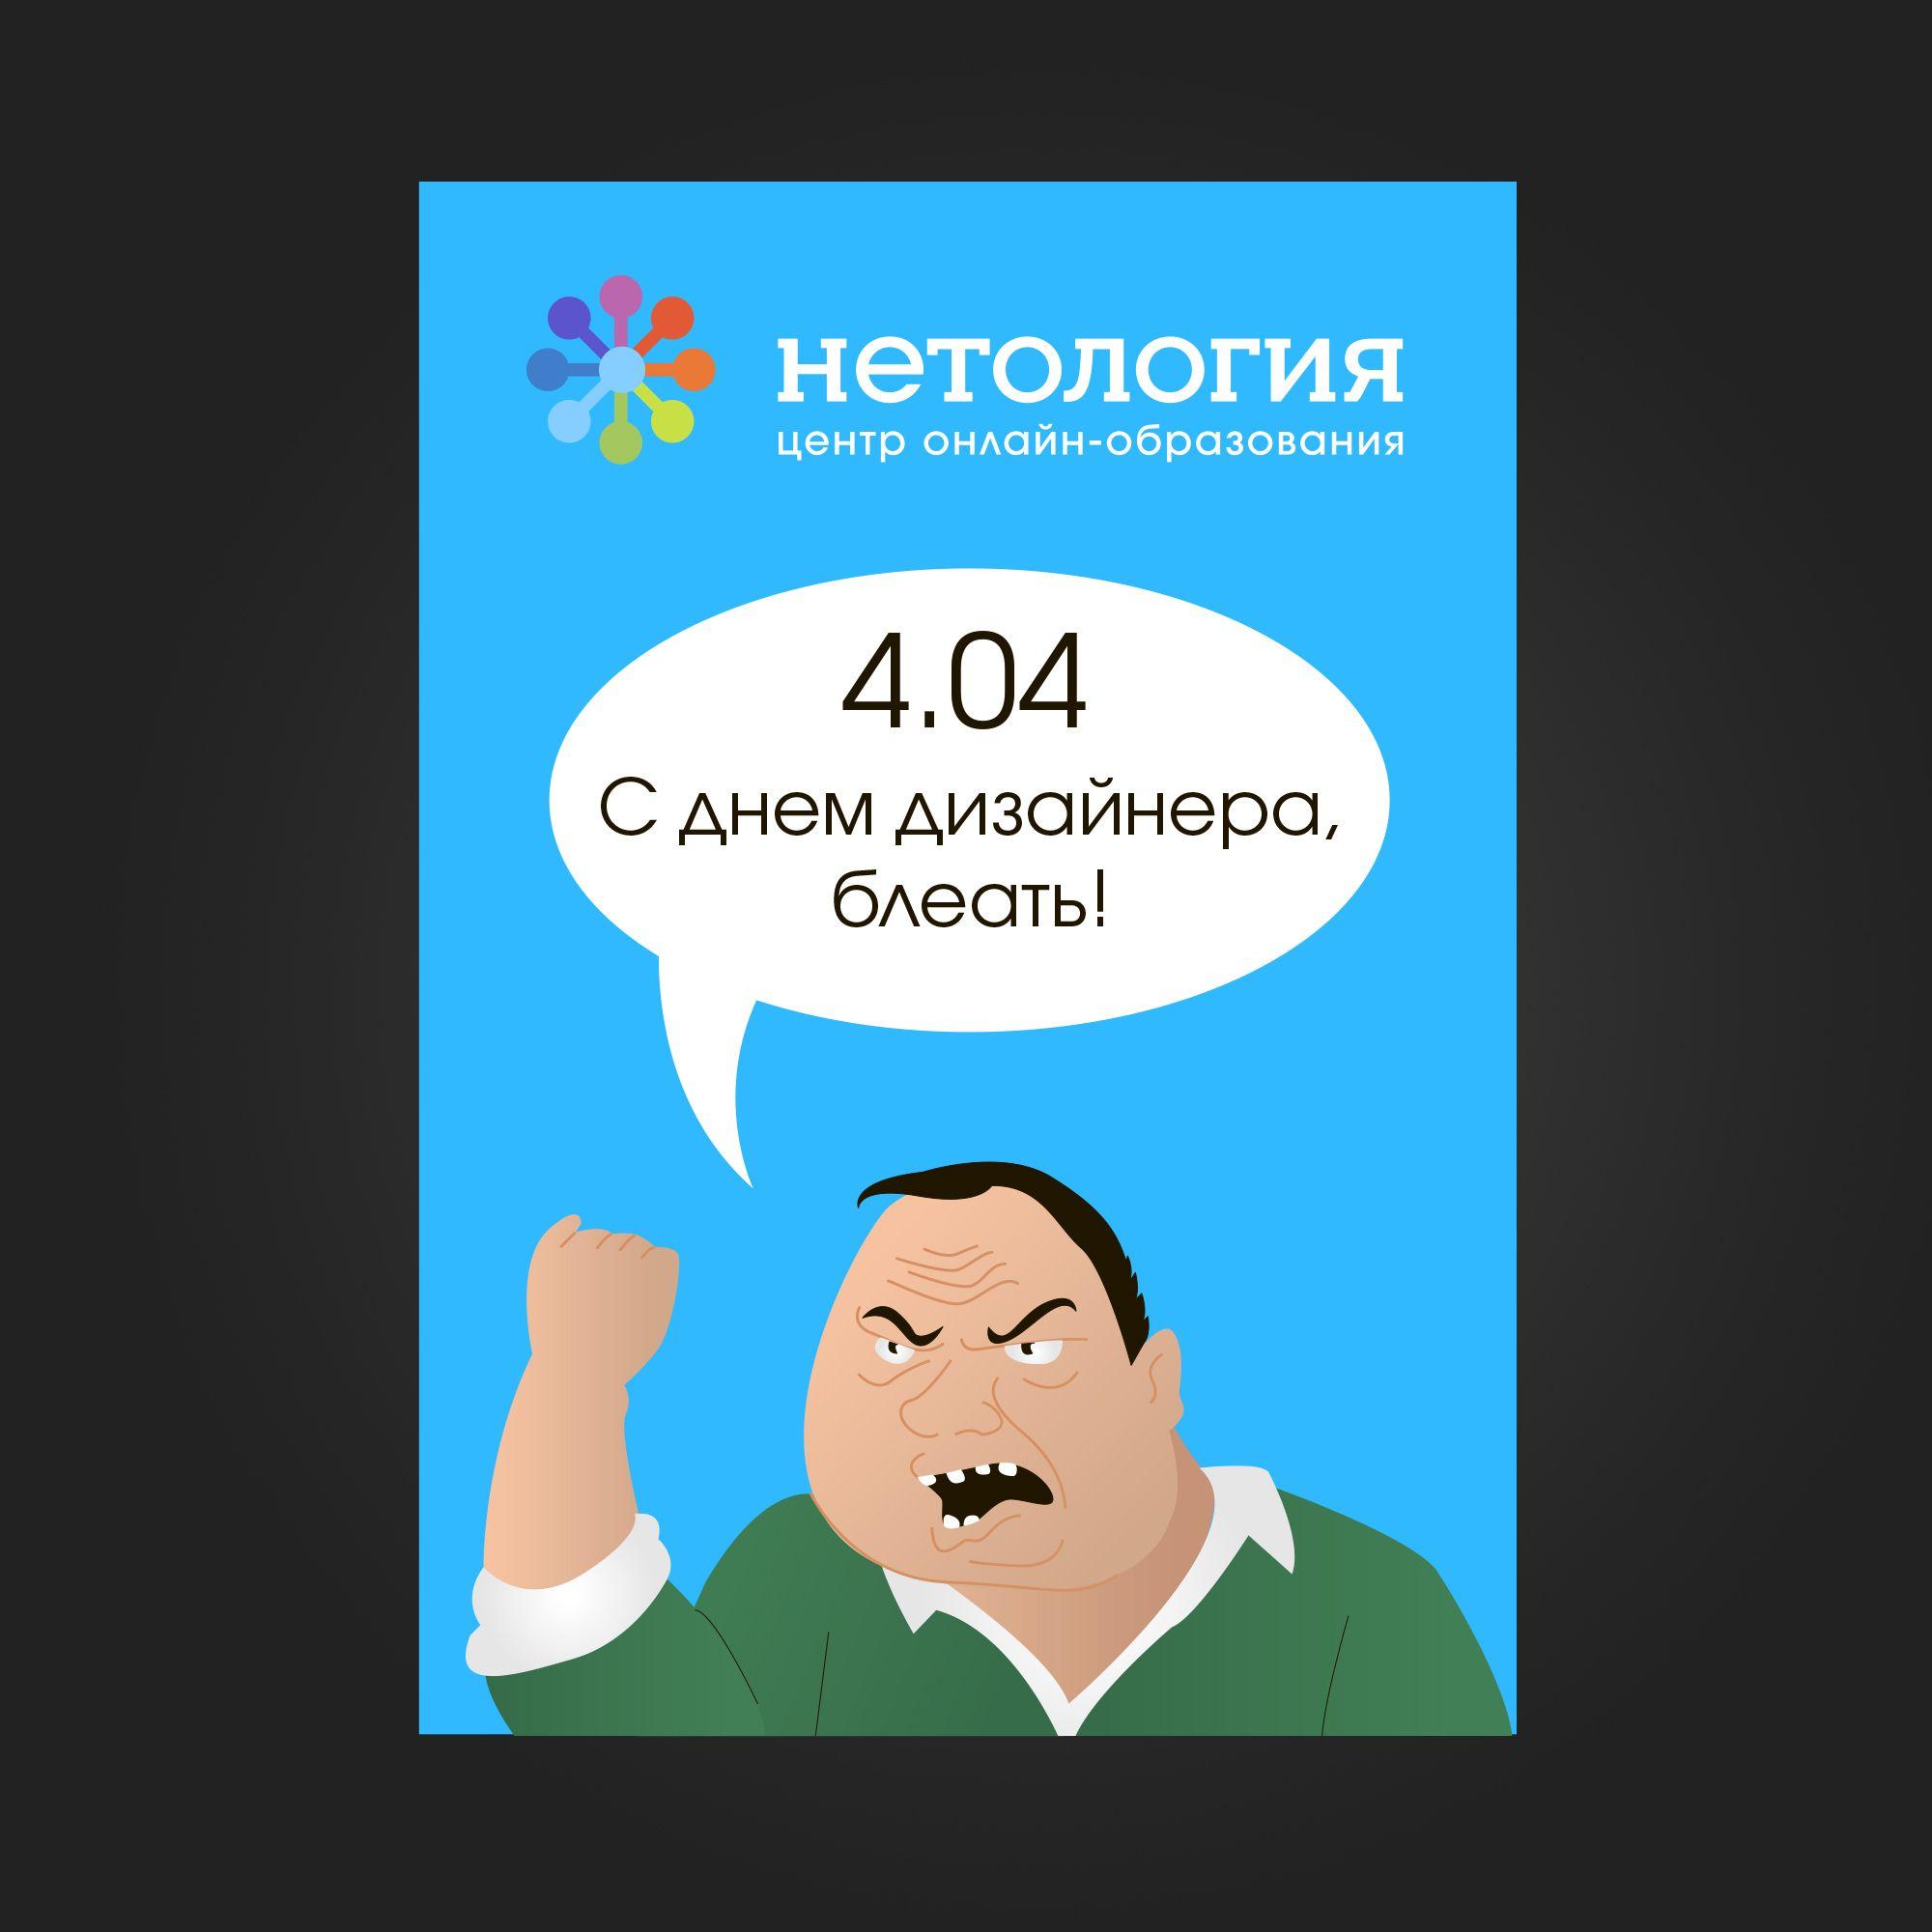 Дизайн открытки. Приз – онлайн-курс по веб-дизайну - дизайнер tixomirovavv